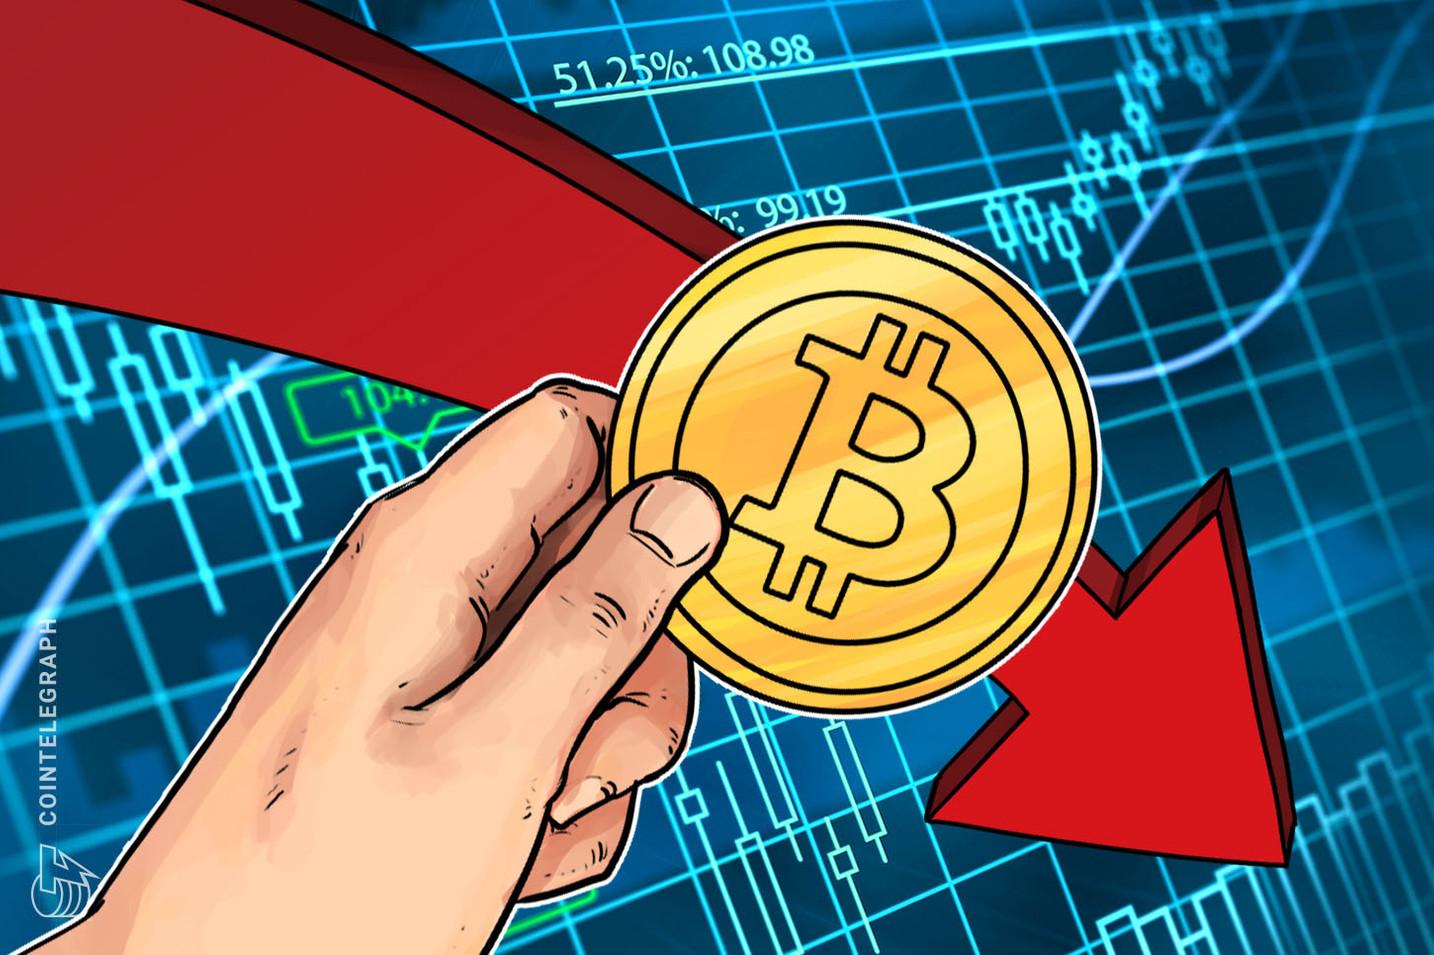 Bitcoin Dives Below $7K as Upbit Confirms $50M 'Abnormal Withdrawal'